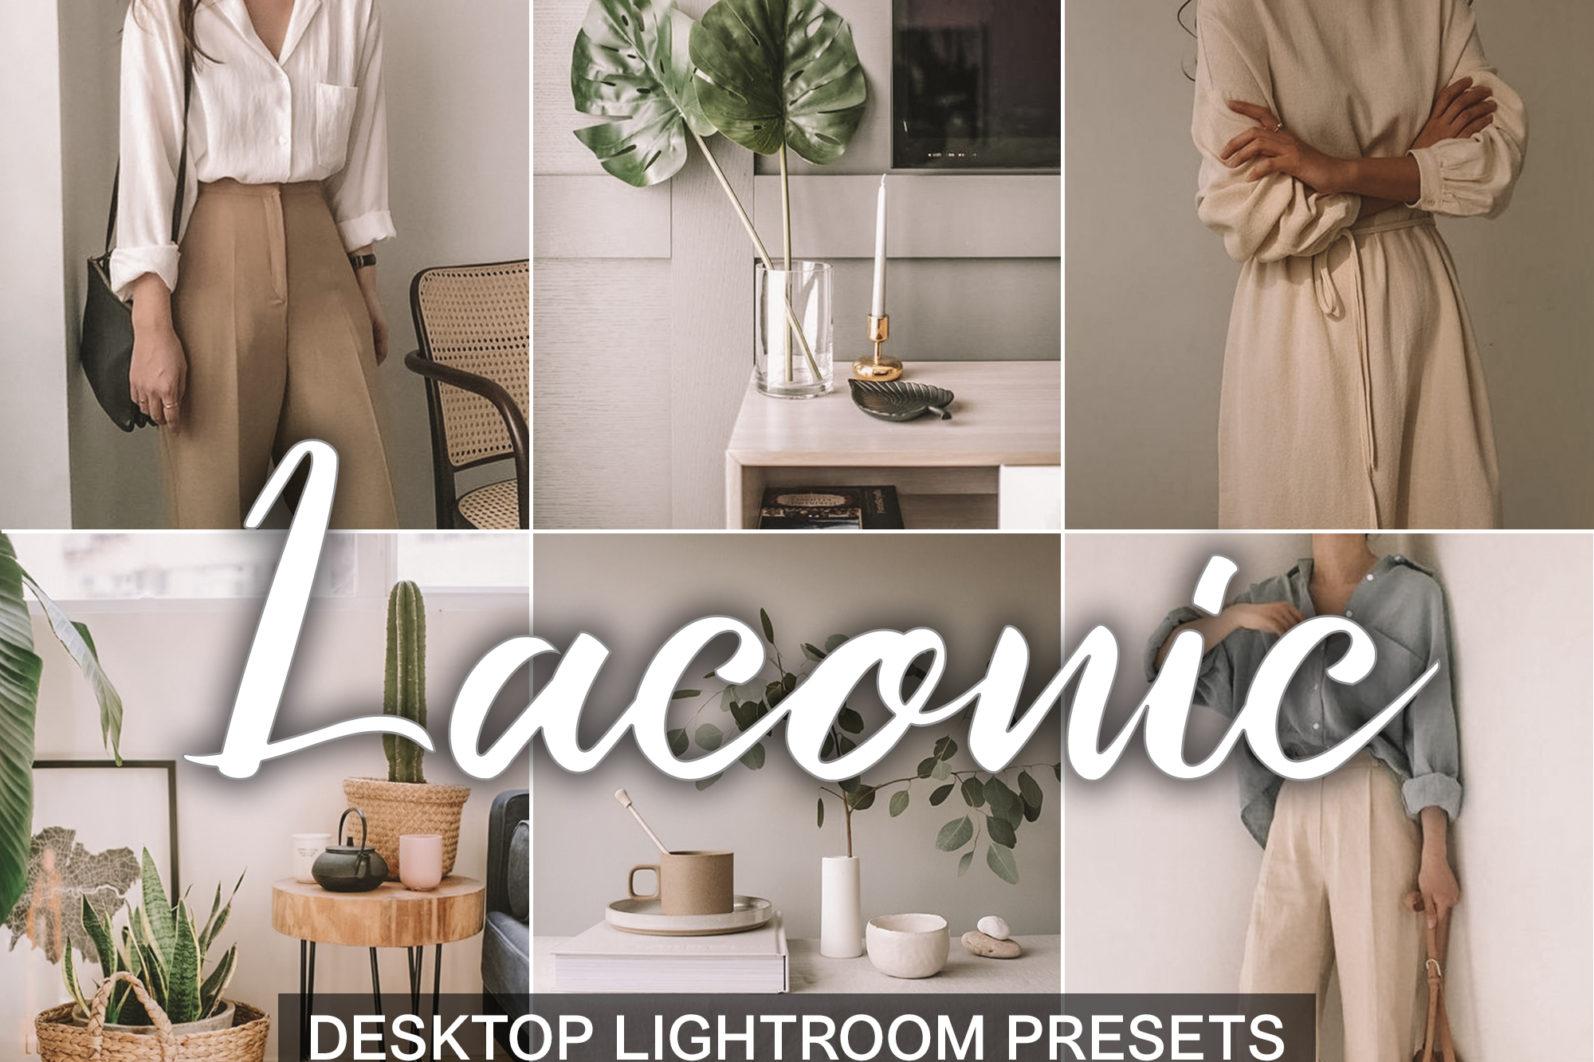 15 Mobile & Desktop Presets LACONIC - laconic lightroom presets desktop cover product -